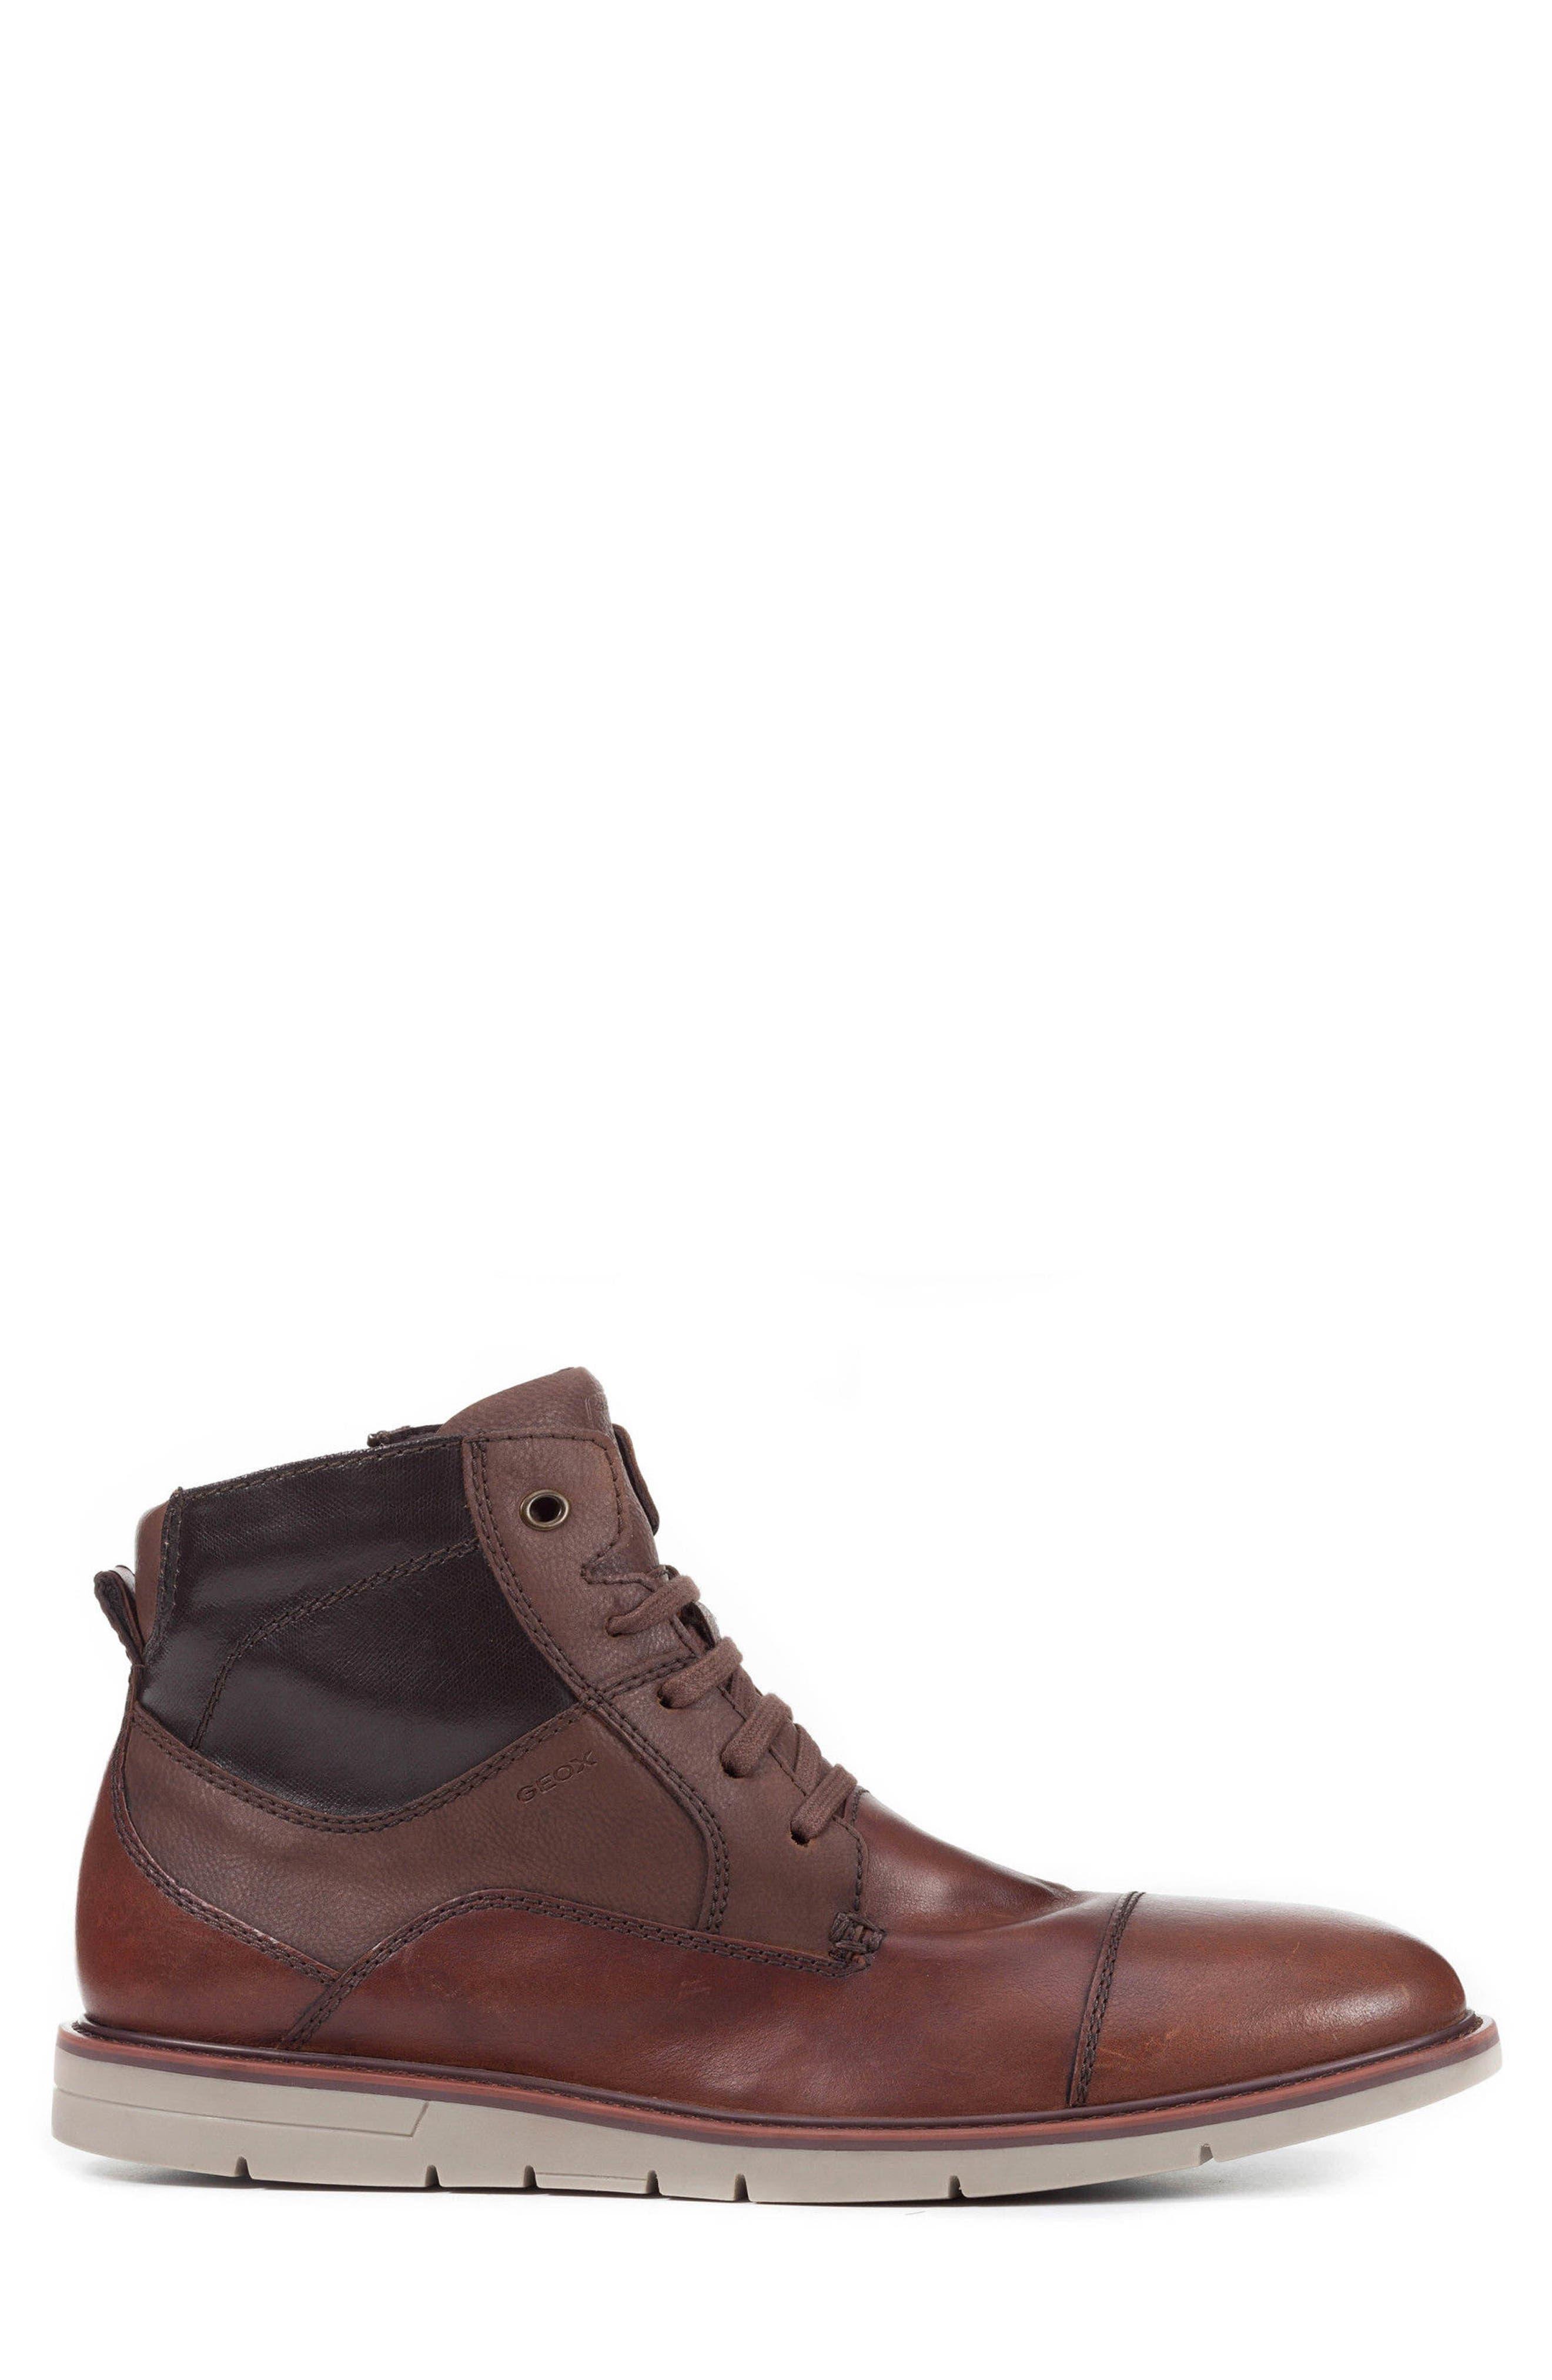 Muvet 5 Cap Toe Boot,                             Alternate thumbnail 6, color,